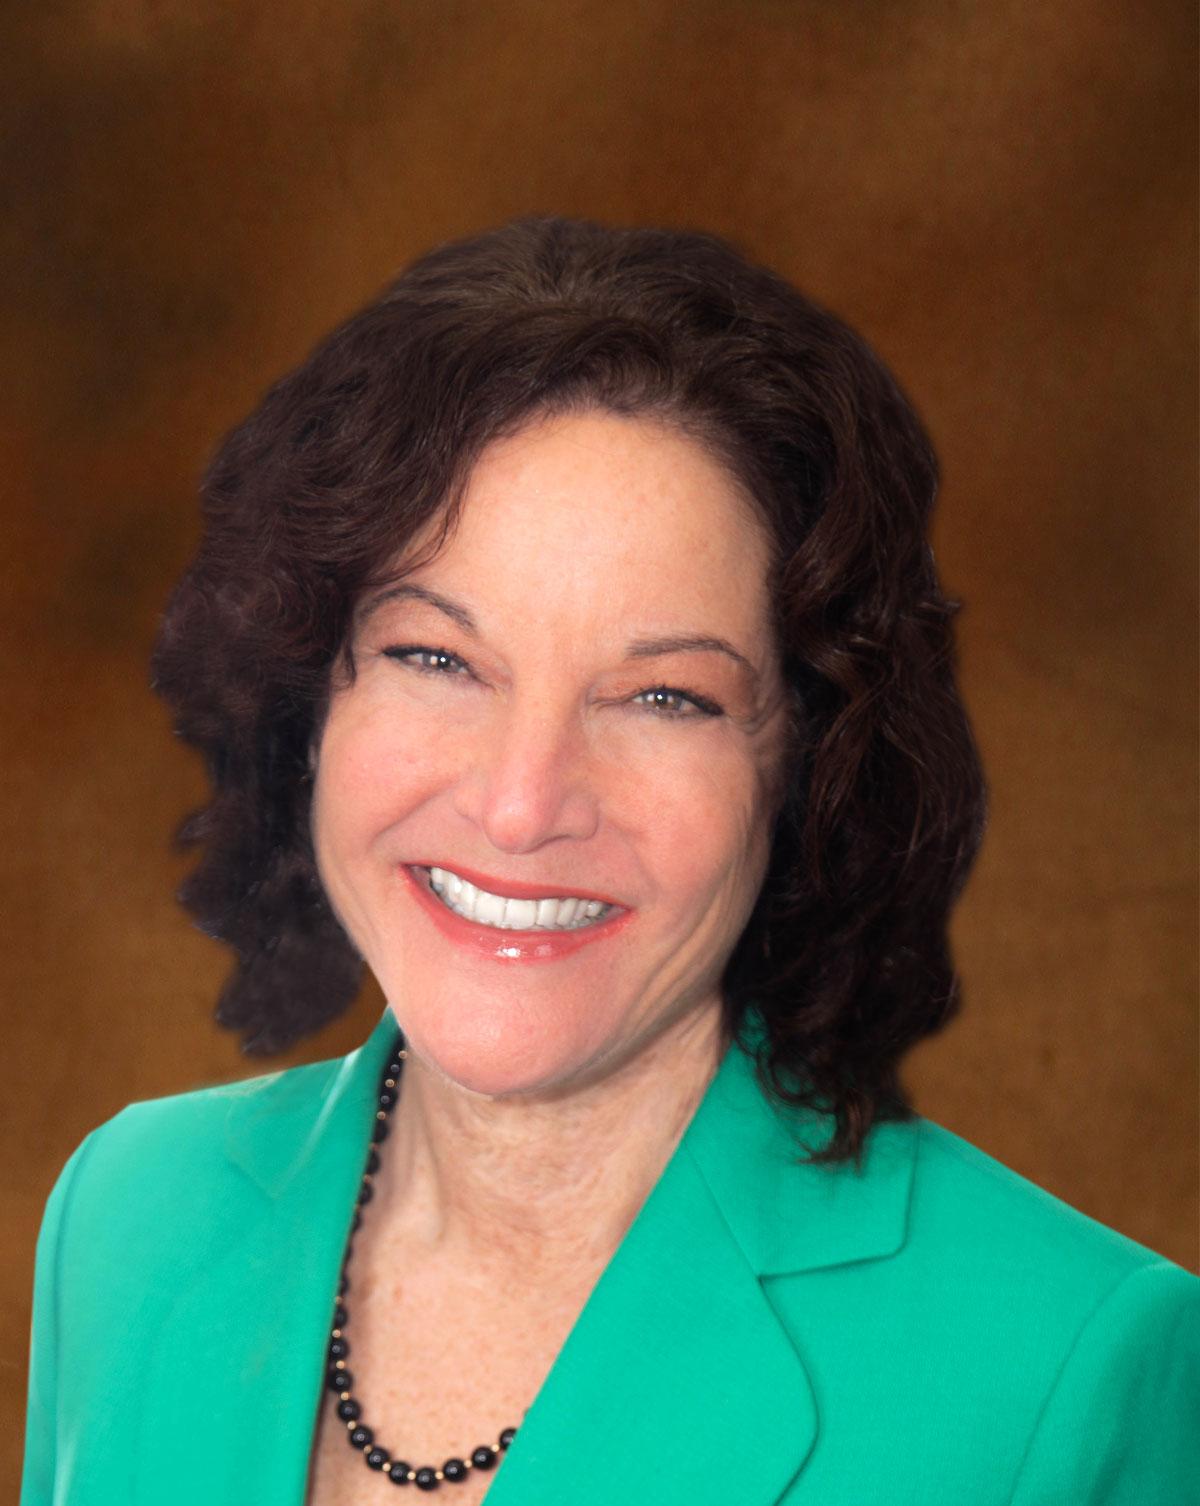 Diane Stumpp, Director of Marketing